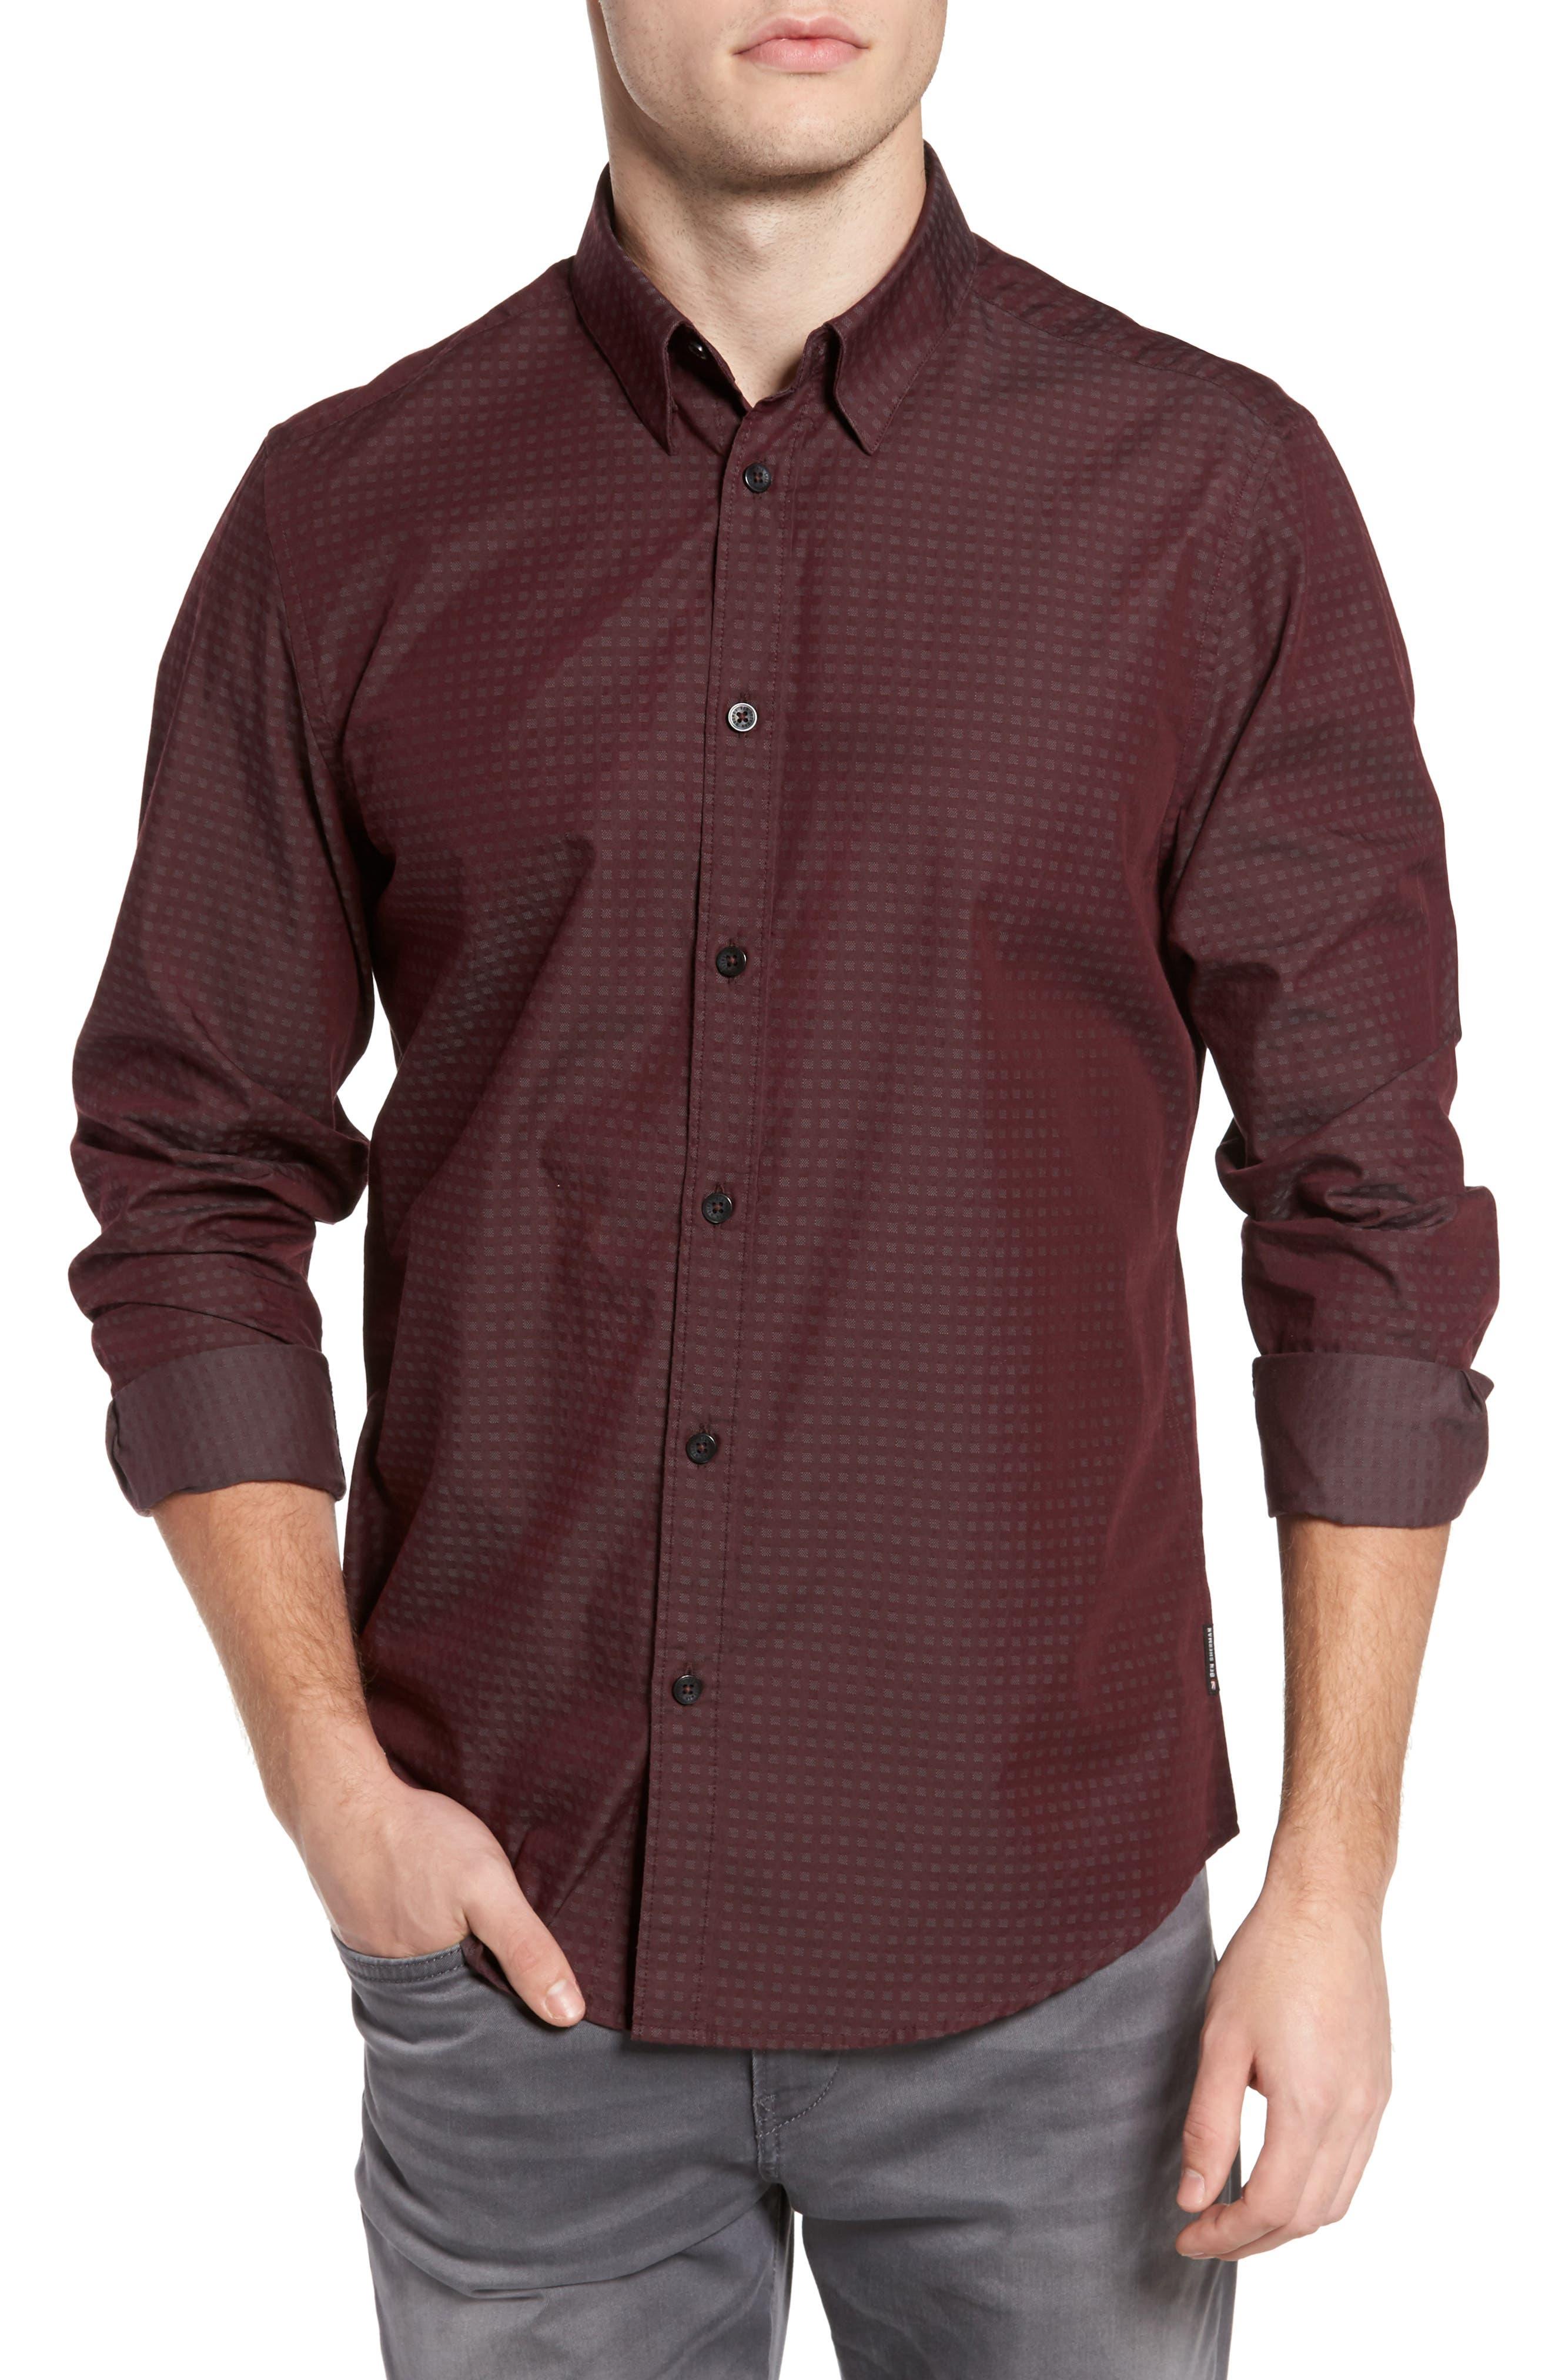 Main Image - Ben Sherman Dobby Checkerboard Woven Shirt